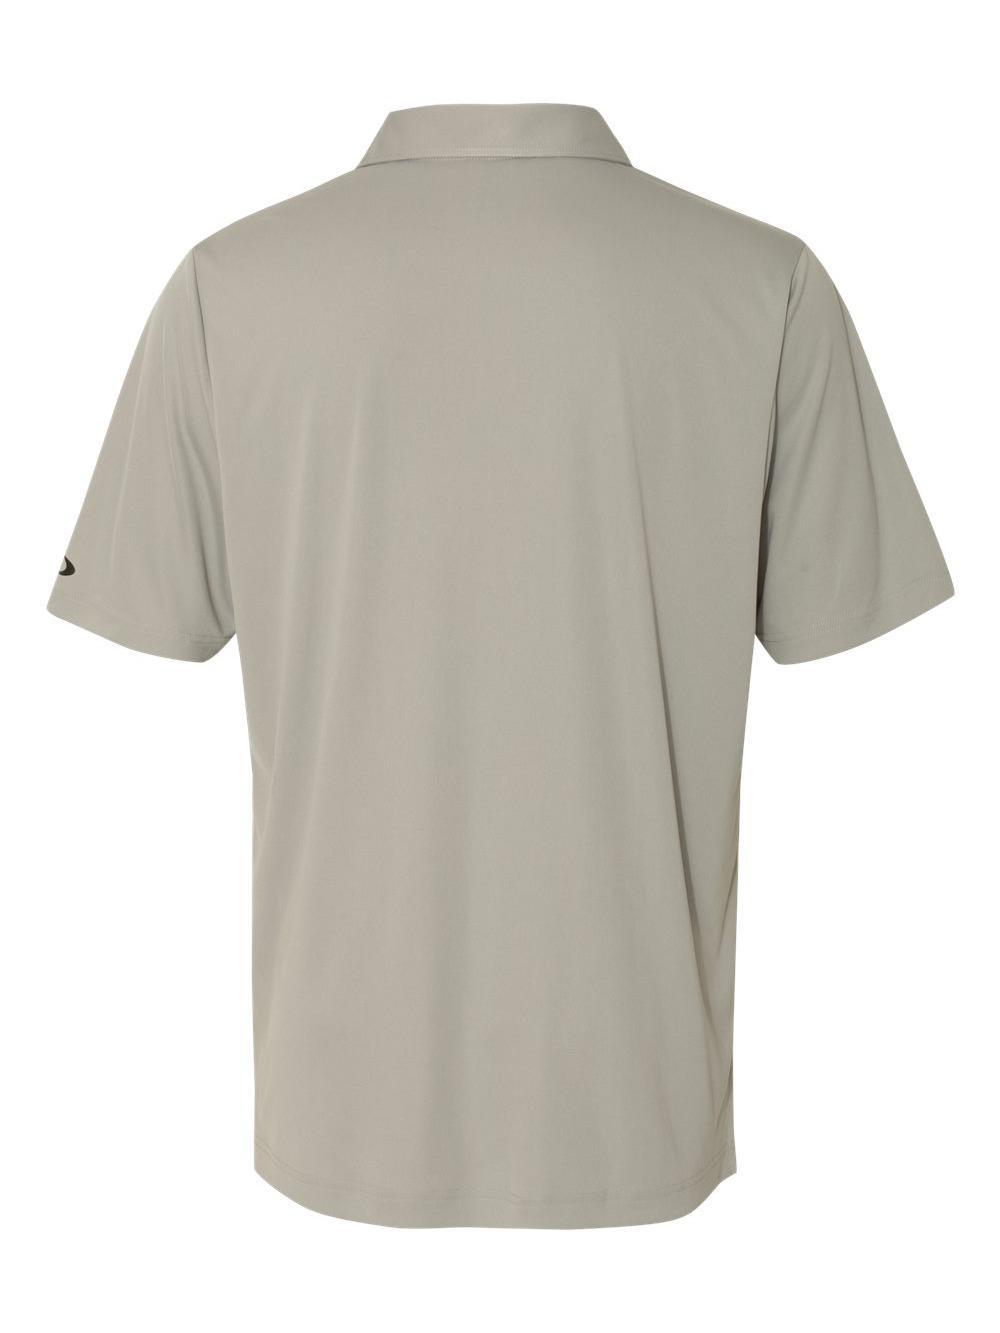 Oakley-Performance-Sport-Shirt-433979ODM thumbnail 16